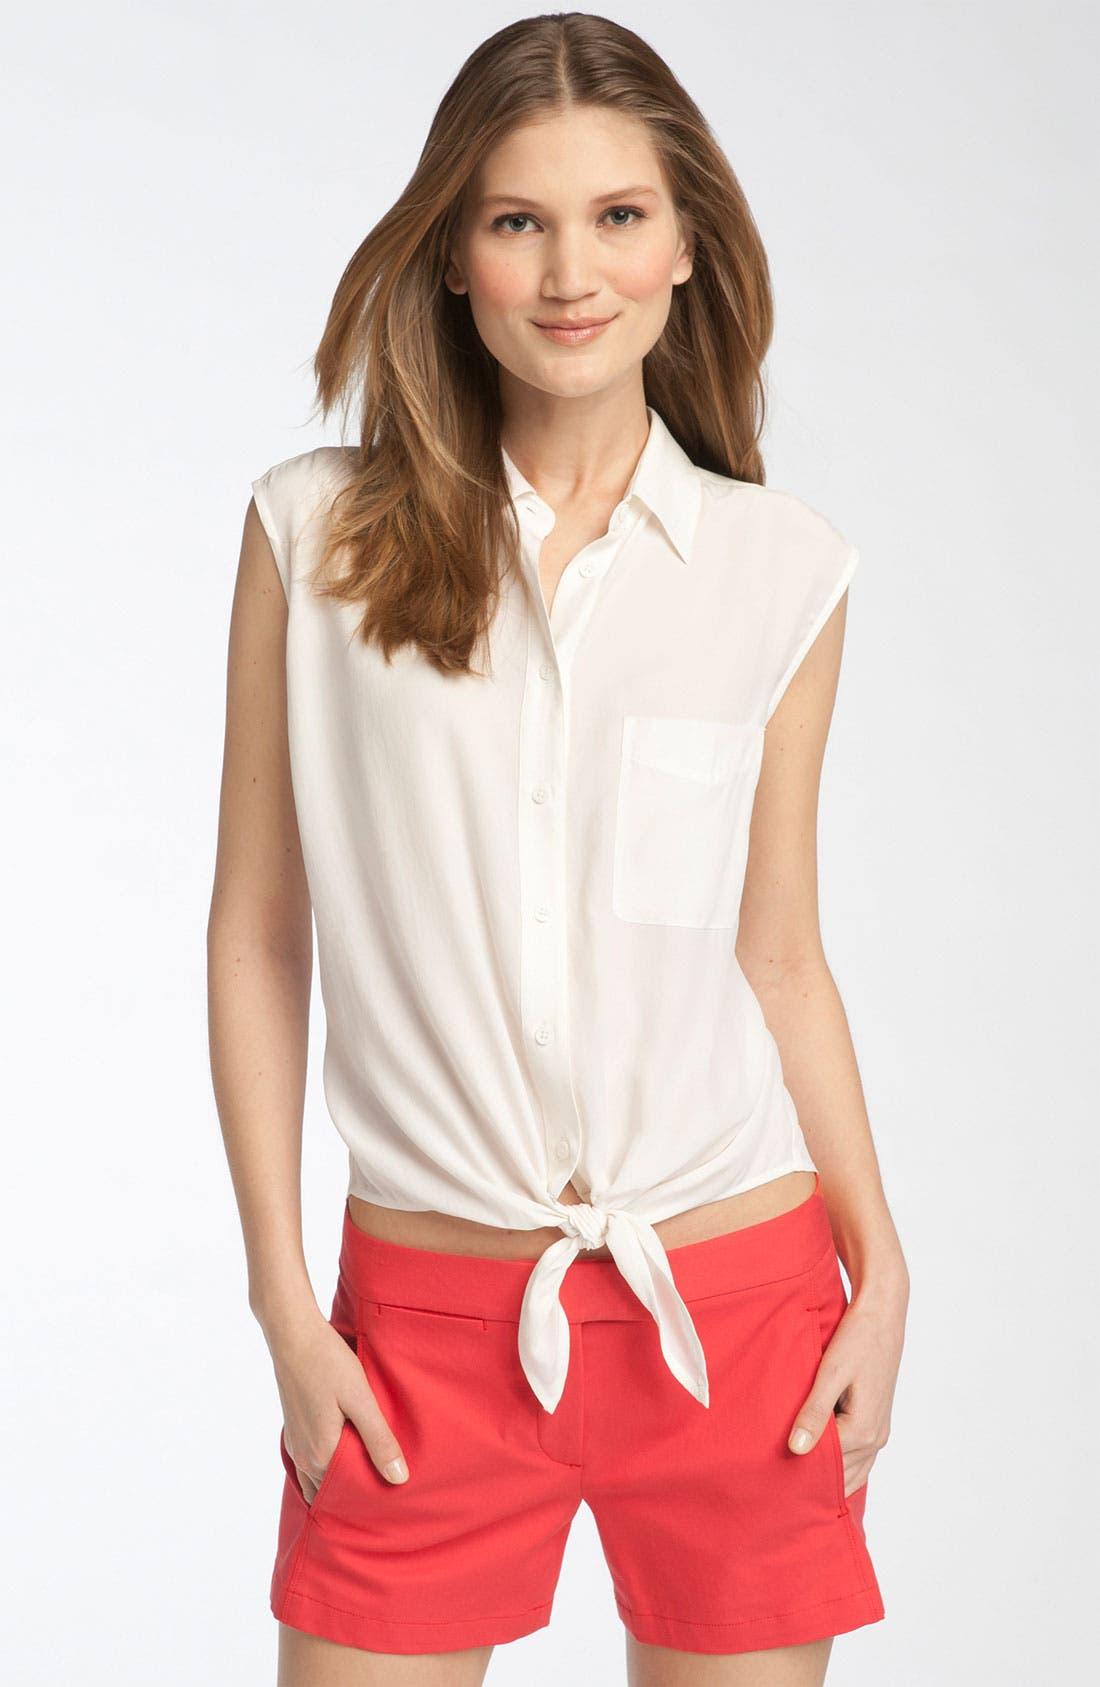 Main Image - Equipment 'Diem' Tie Front Sleeveless Silk Blouse